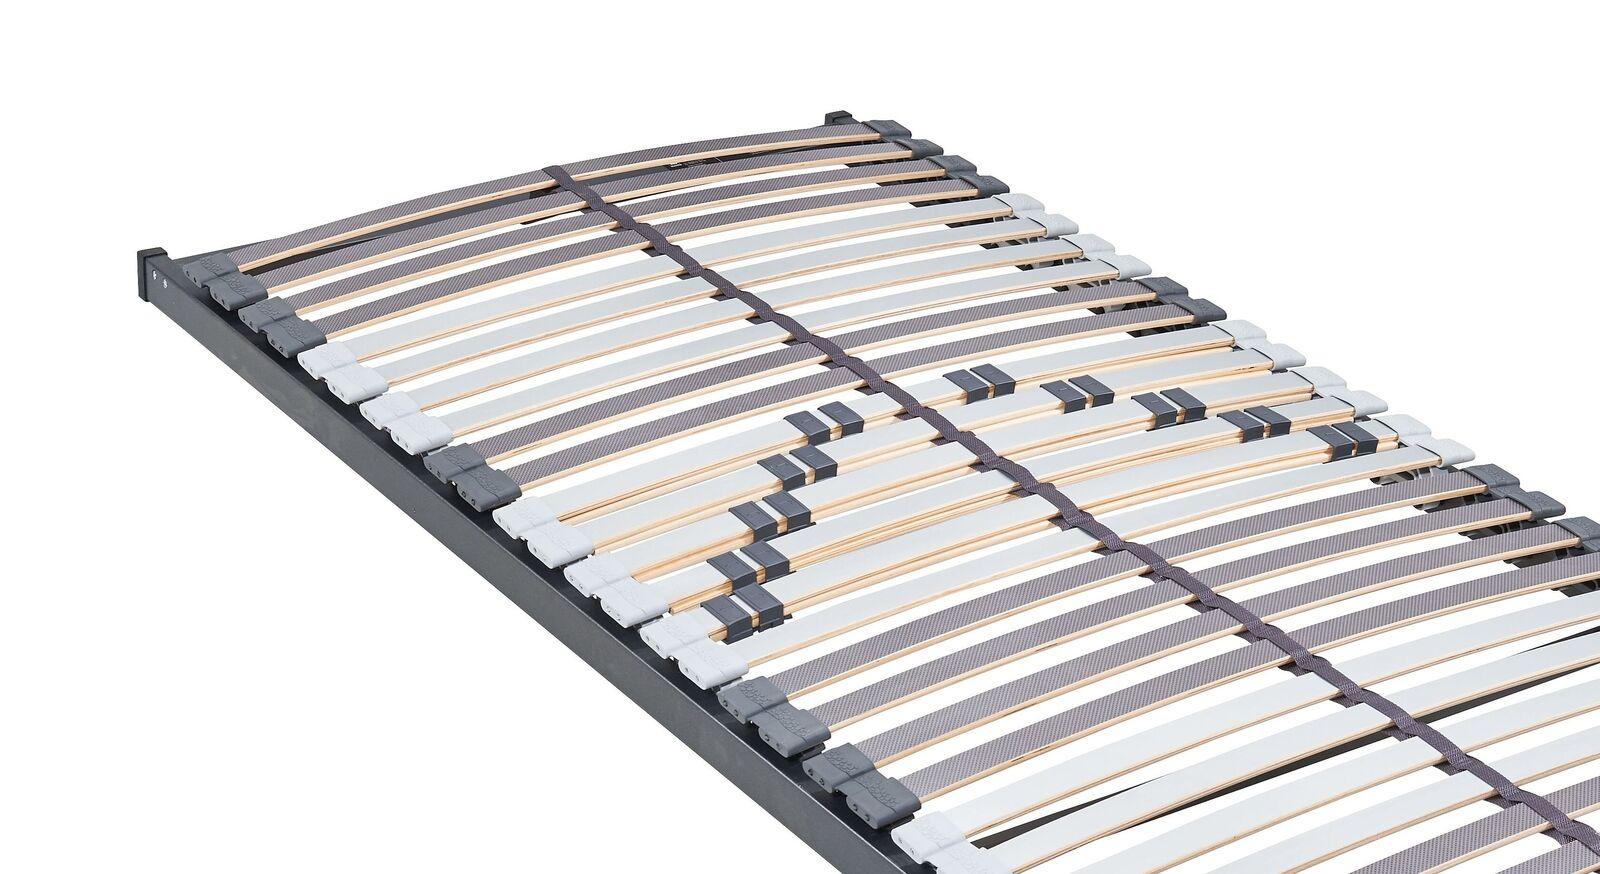 MUSTERRING Lattenrost Orthomatic FHR 40 mit verstärkten Zonen